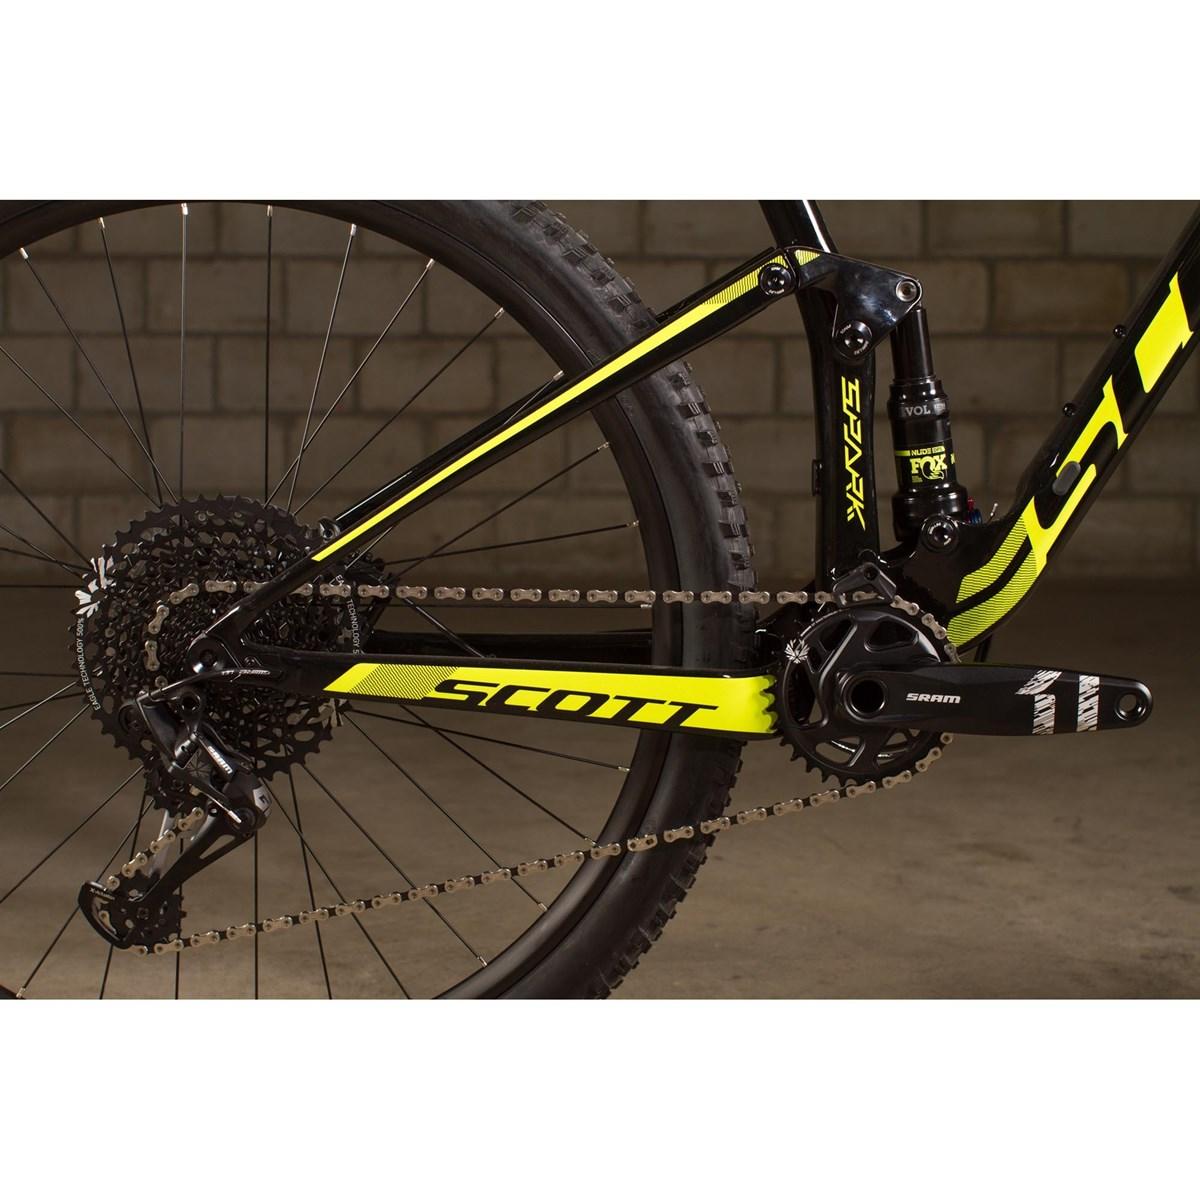 Scott Spark 940 (Modelljahr 2018) - mountainbike-magazin.de